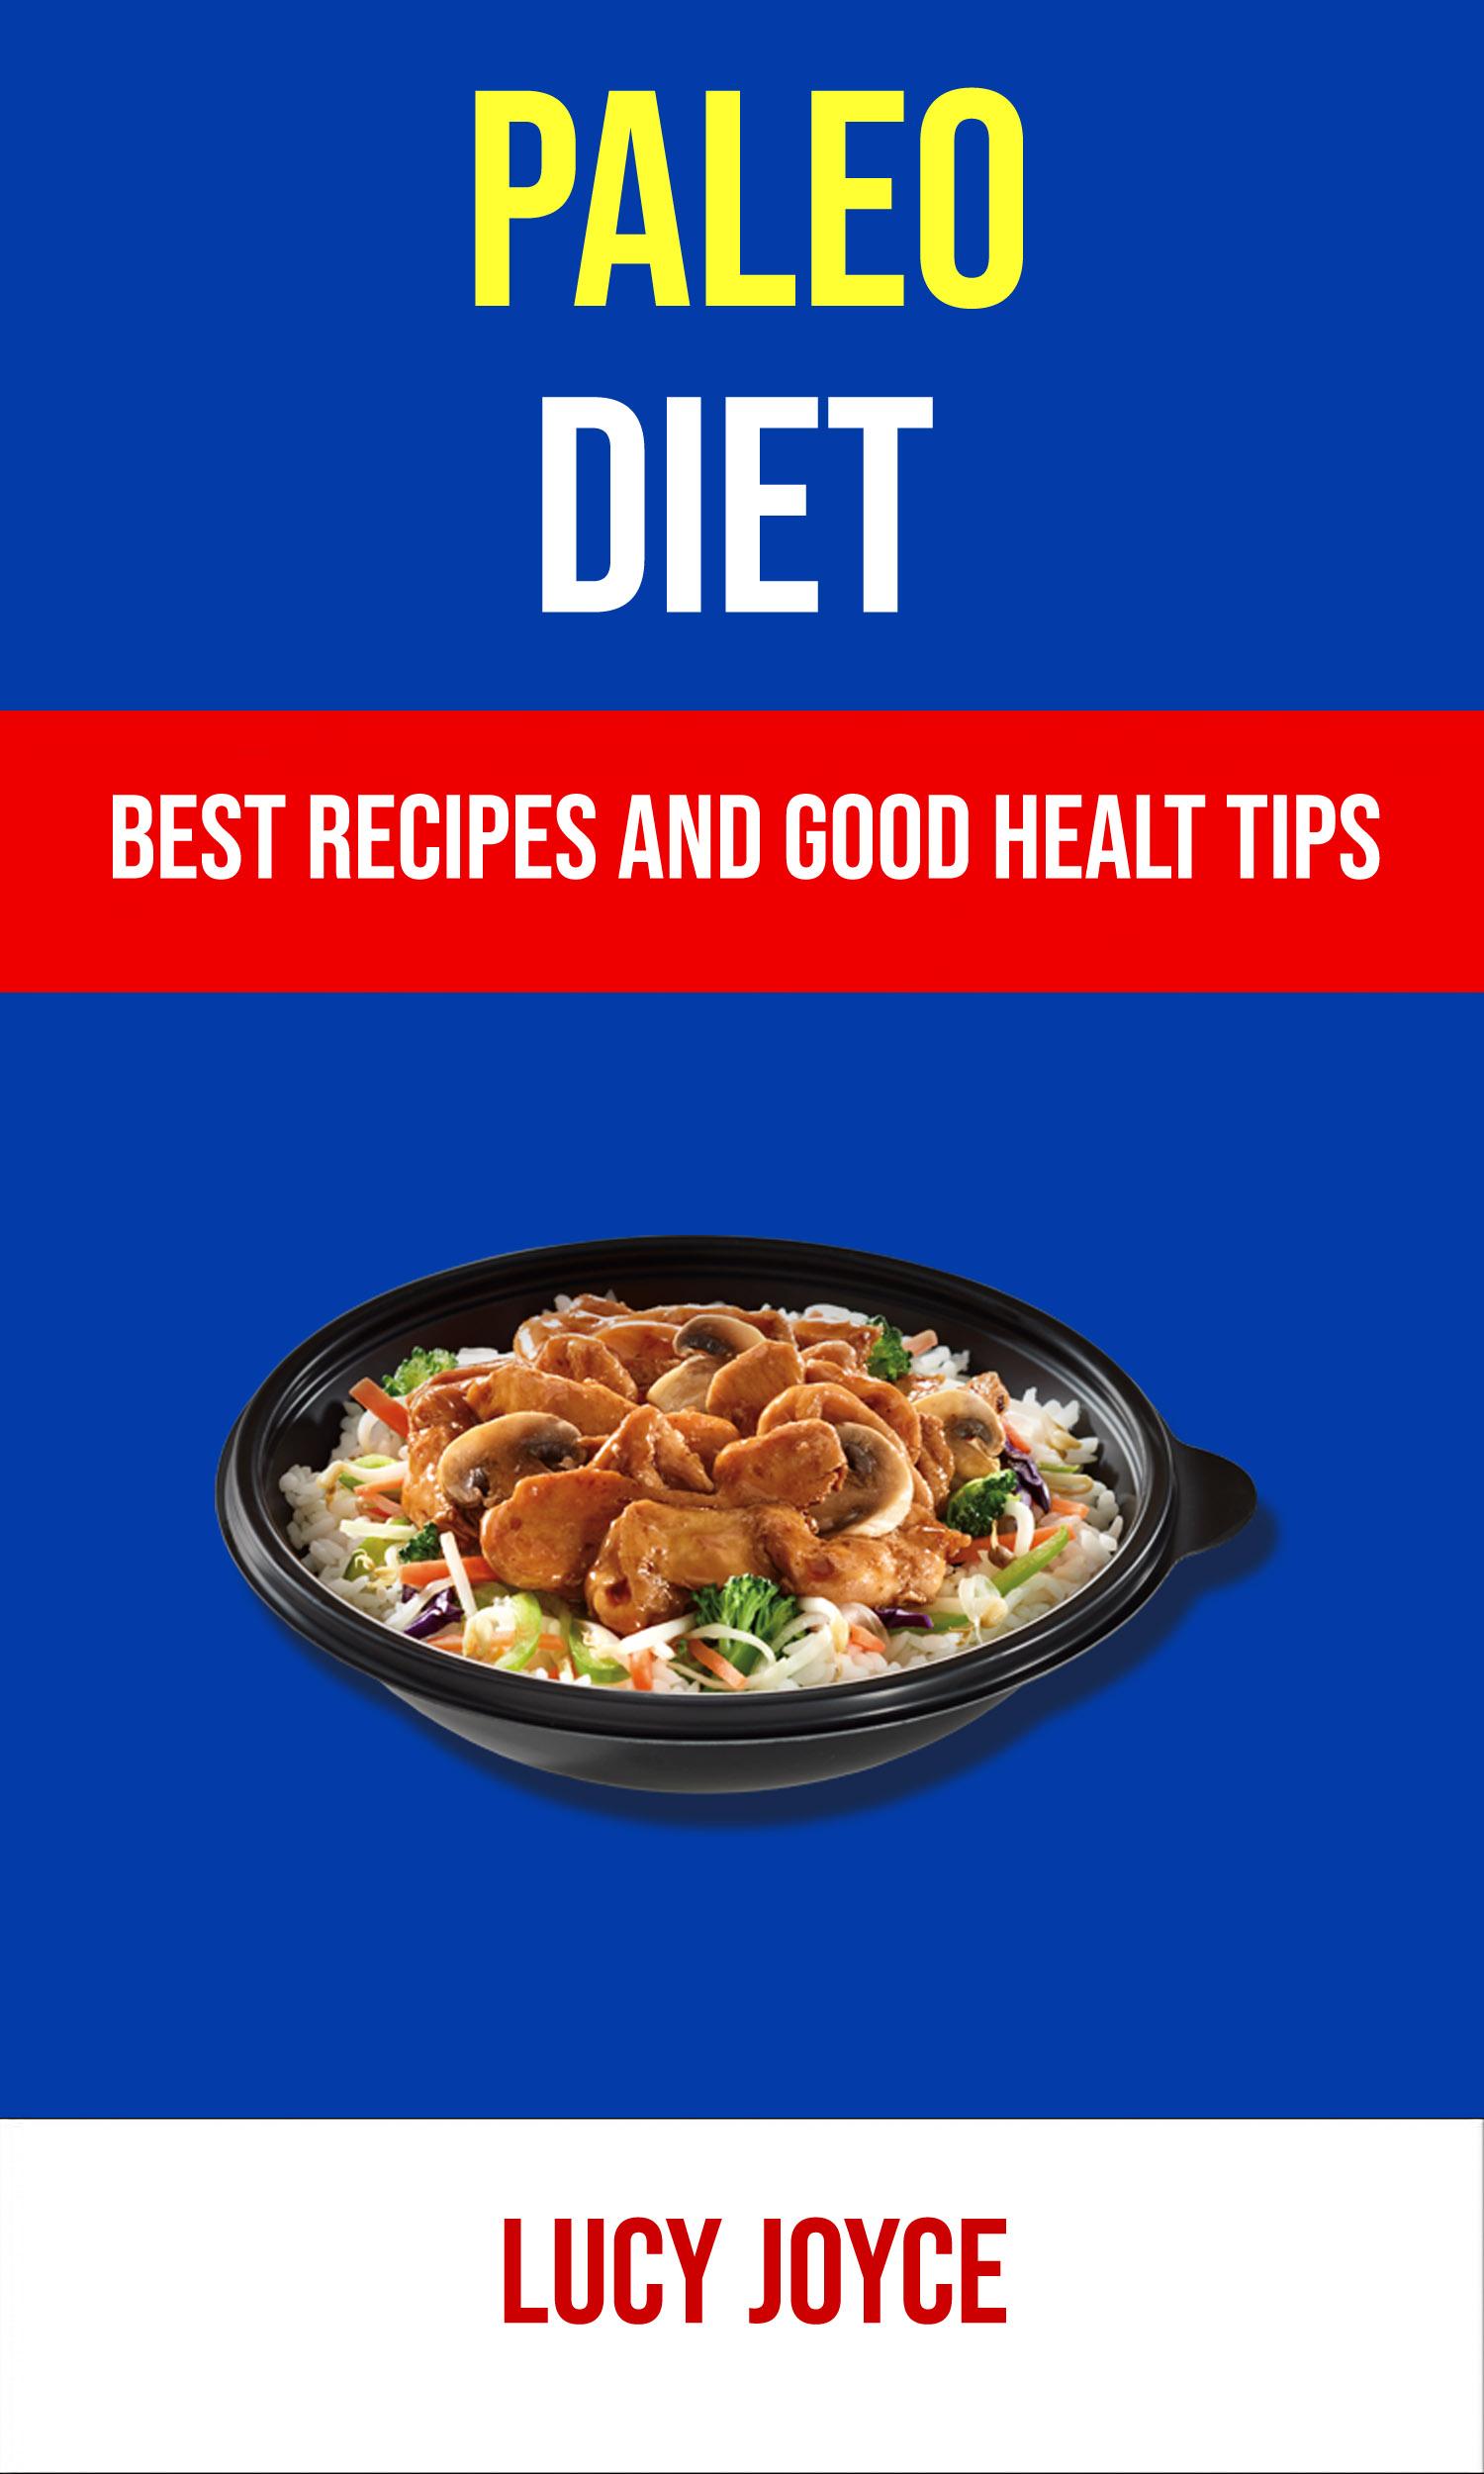 Paleo diet: best recipes and good healt tips